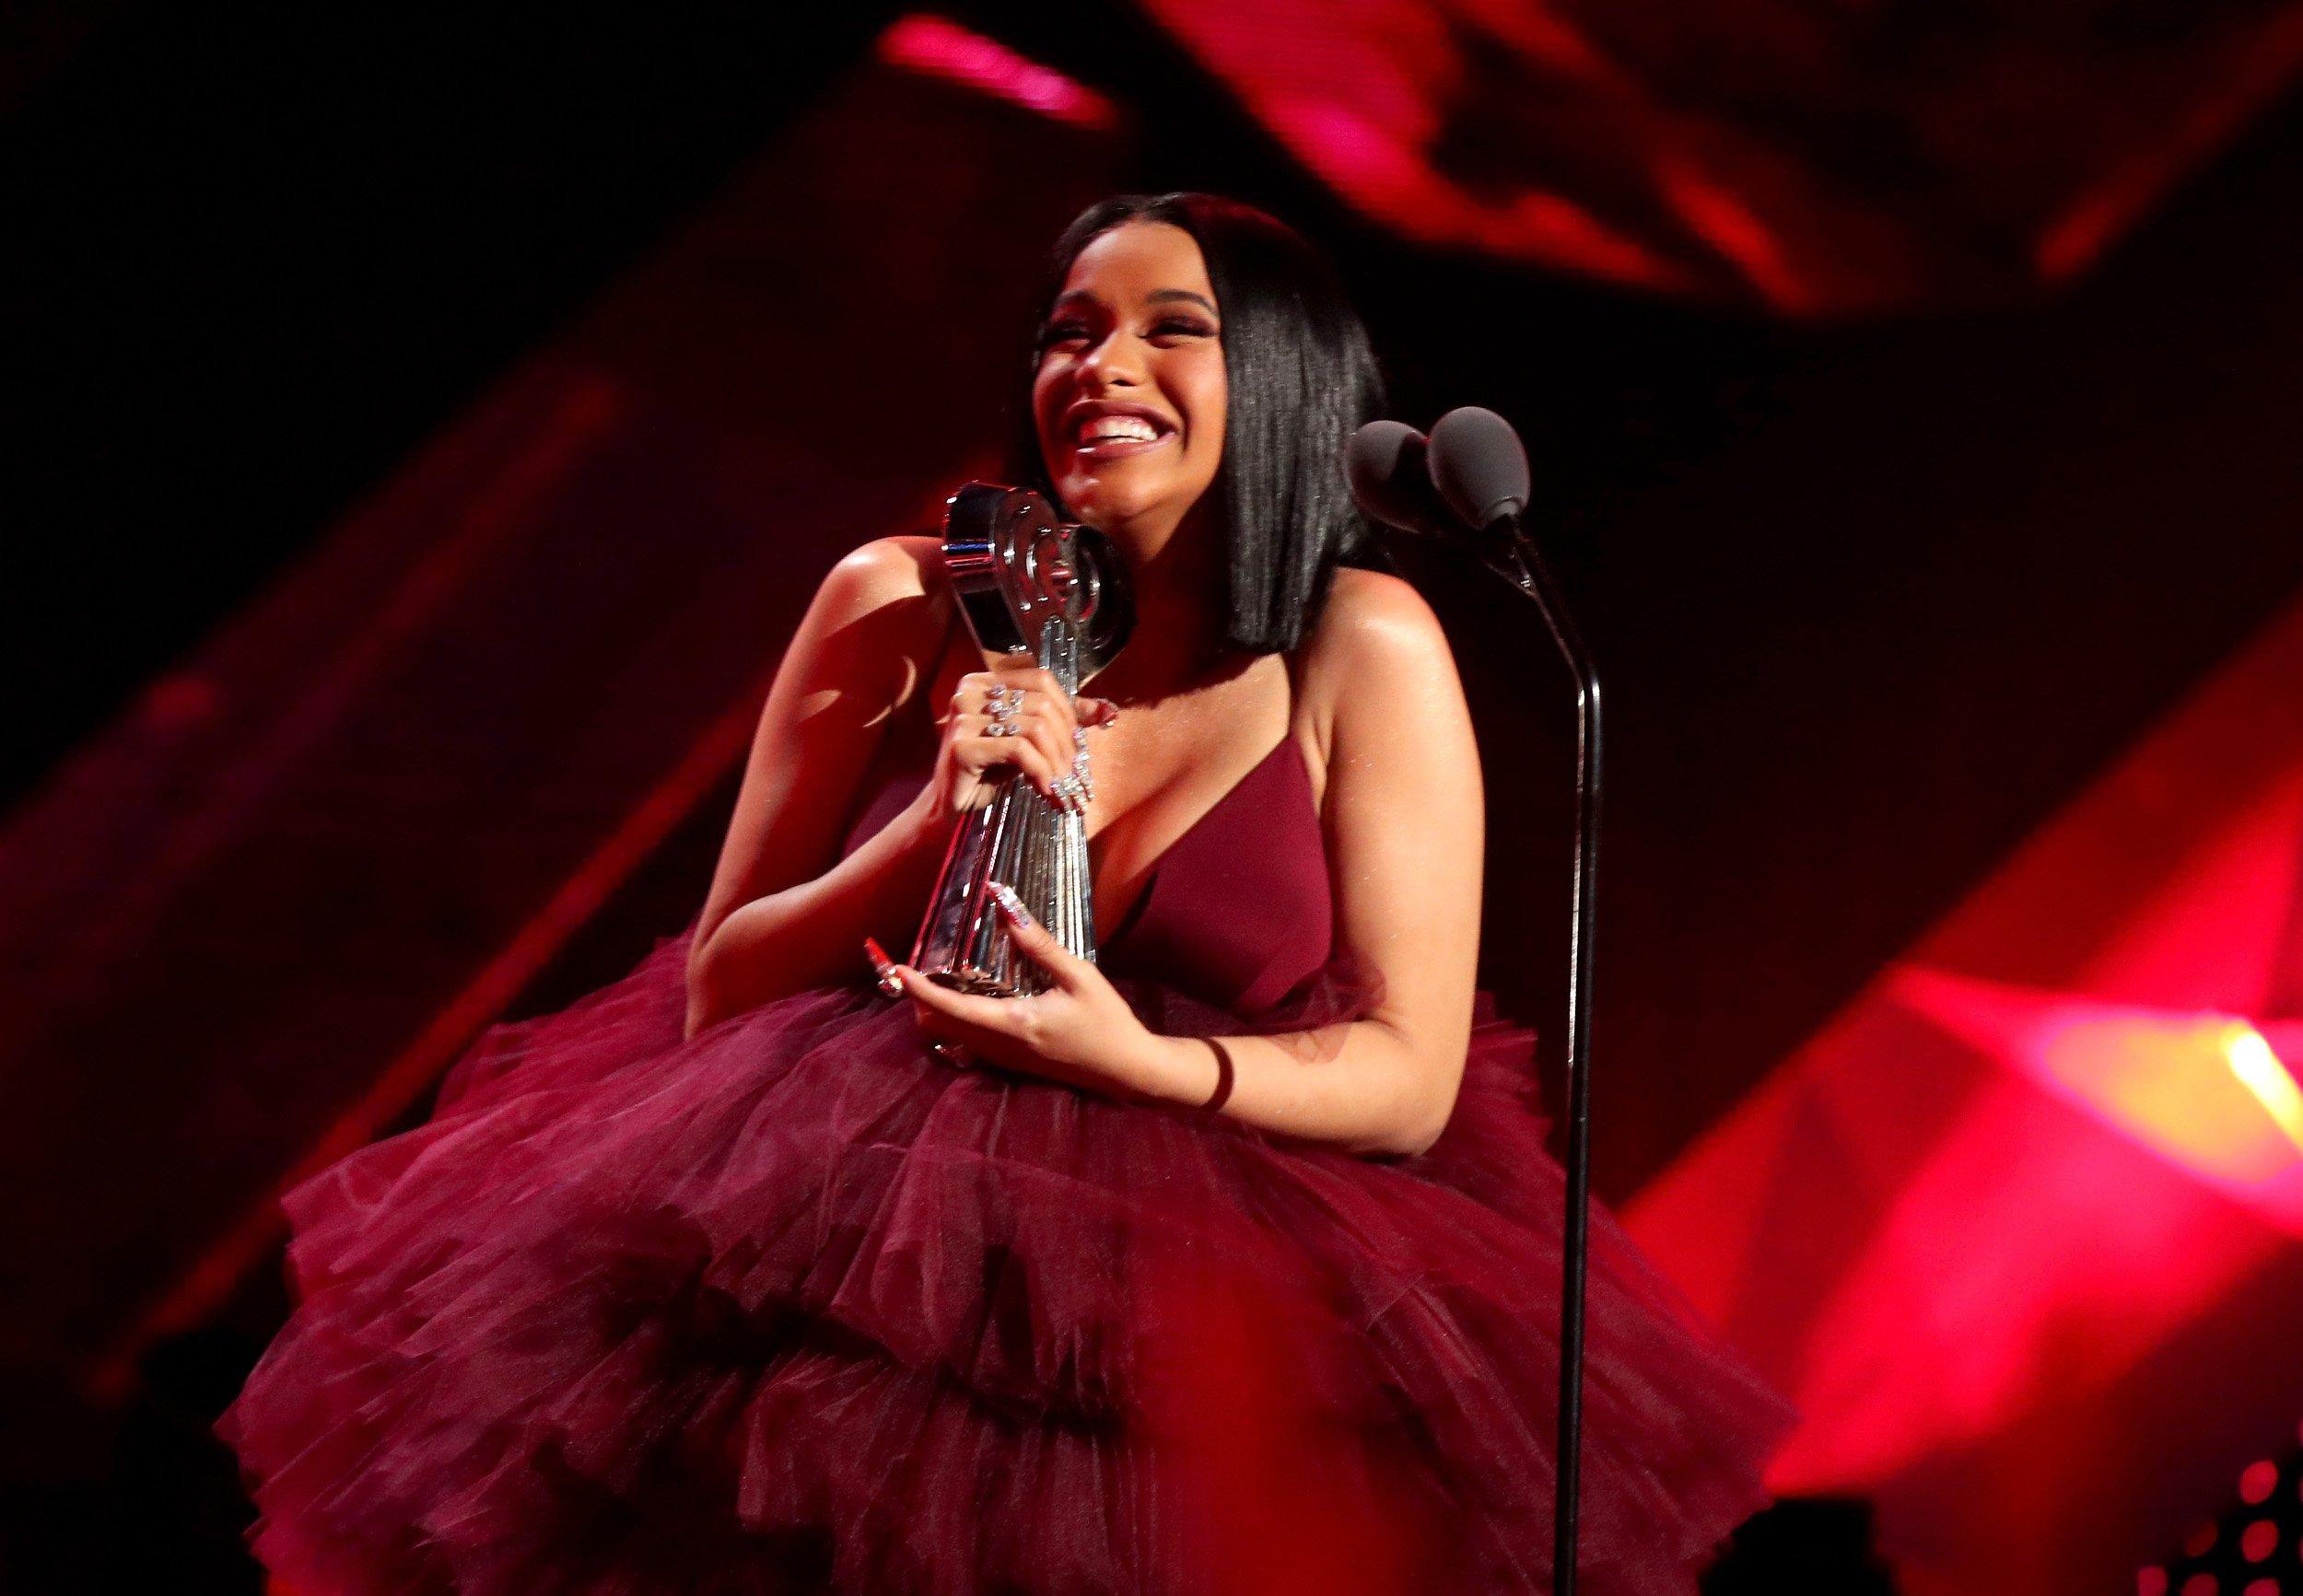 Cardi B at 2019 iHeartRadio Awards